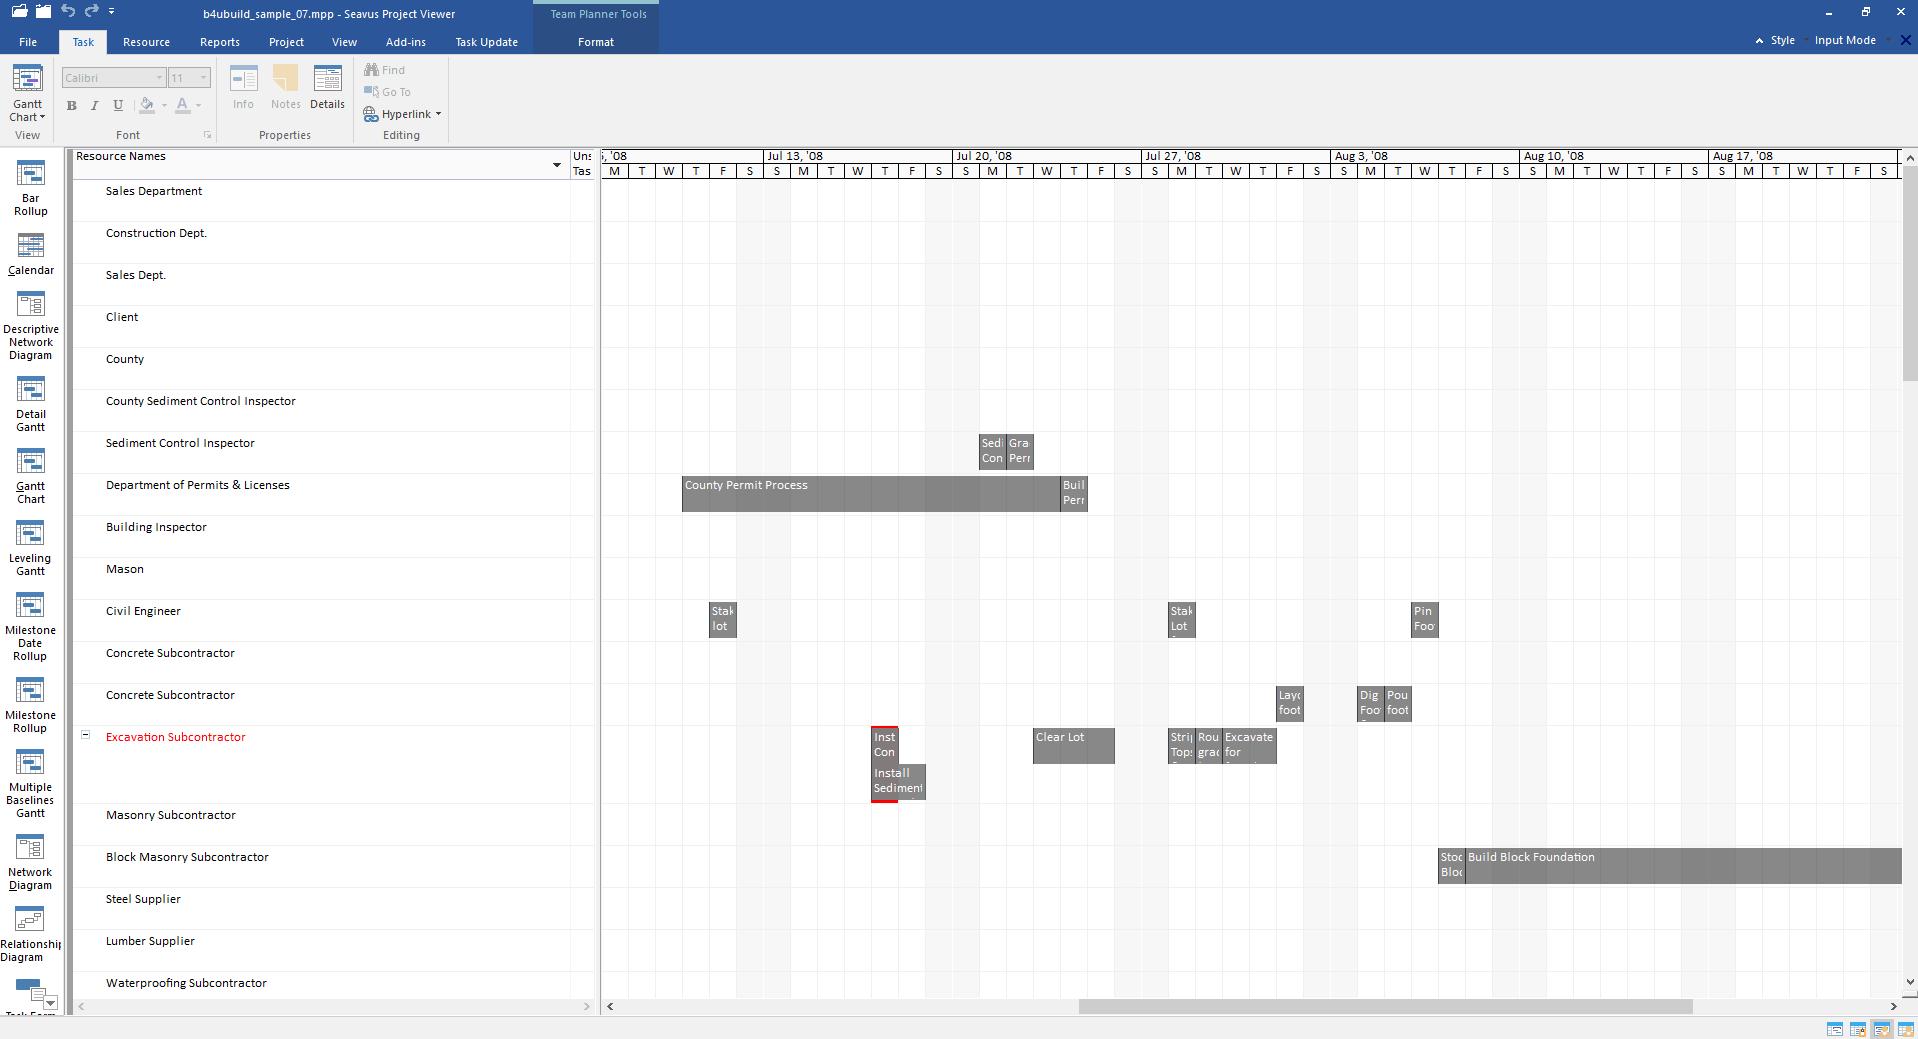 team-planner